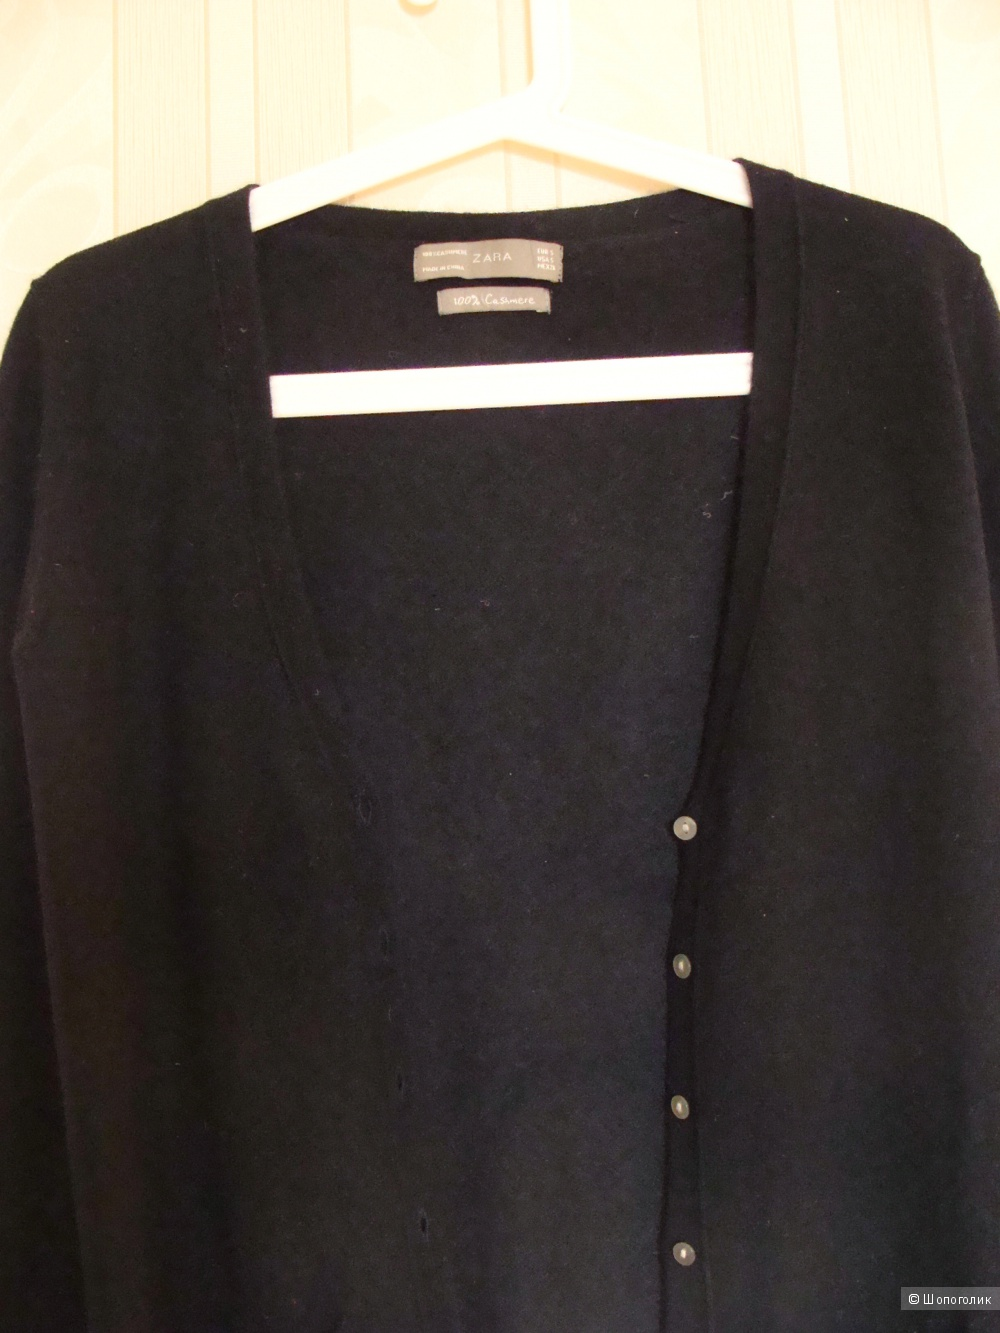 Кашемировый кардиган Zara размер XS-S